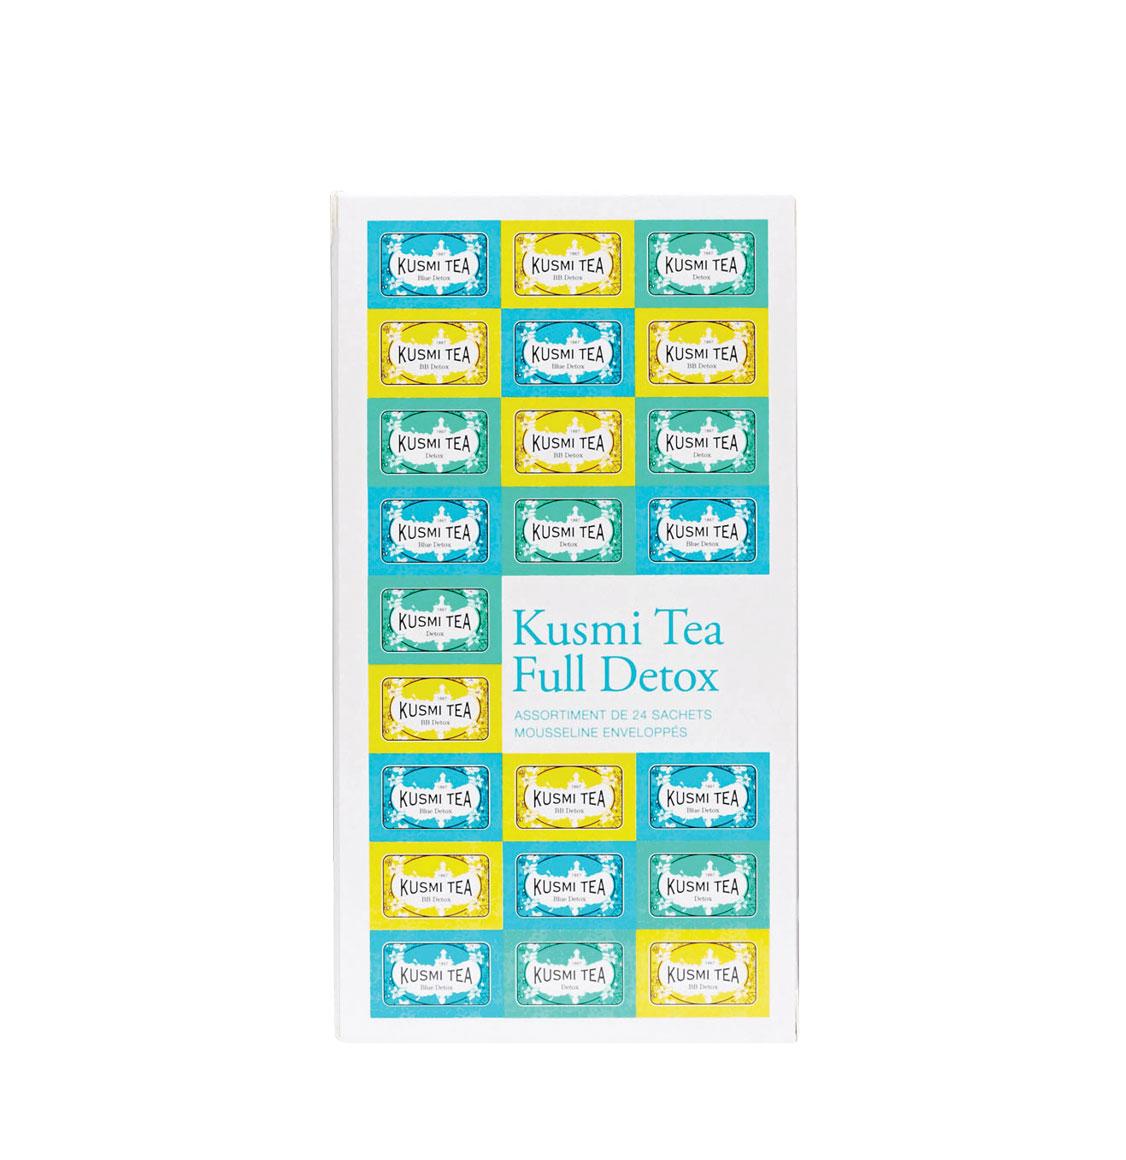 Kusmi Tea Full Detox Tea Bags Assortment 24 Φακελάκια